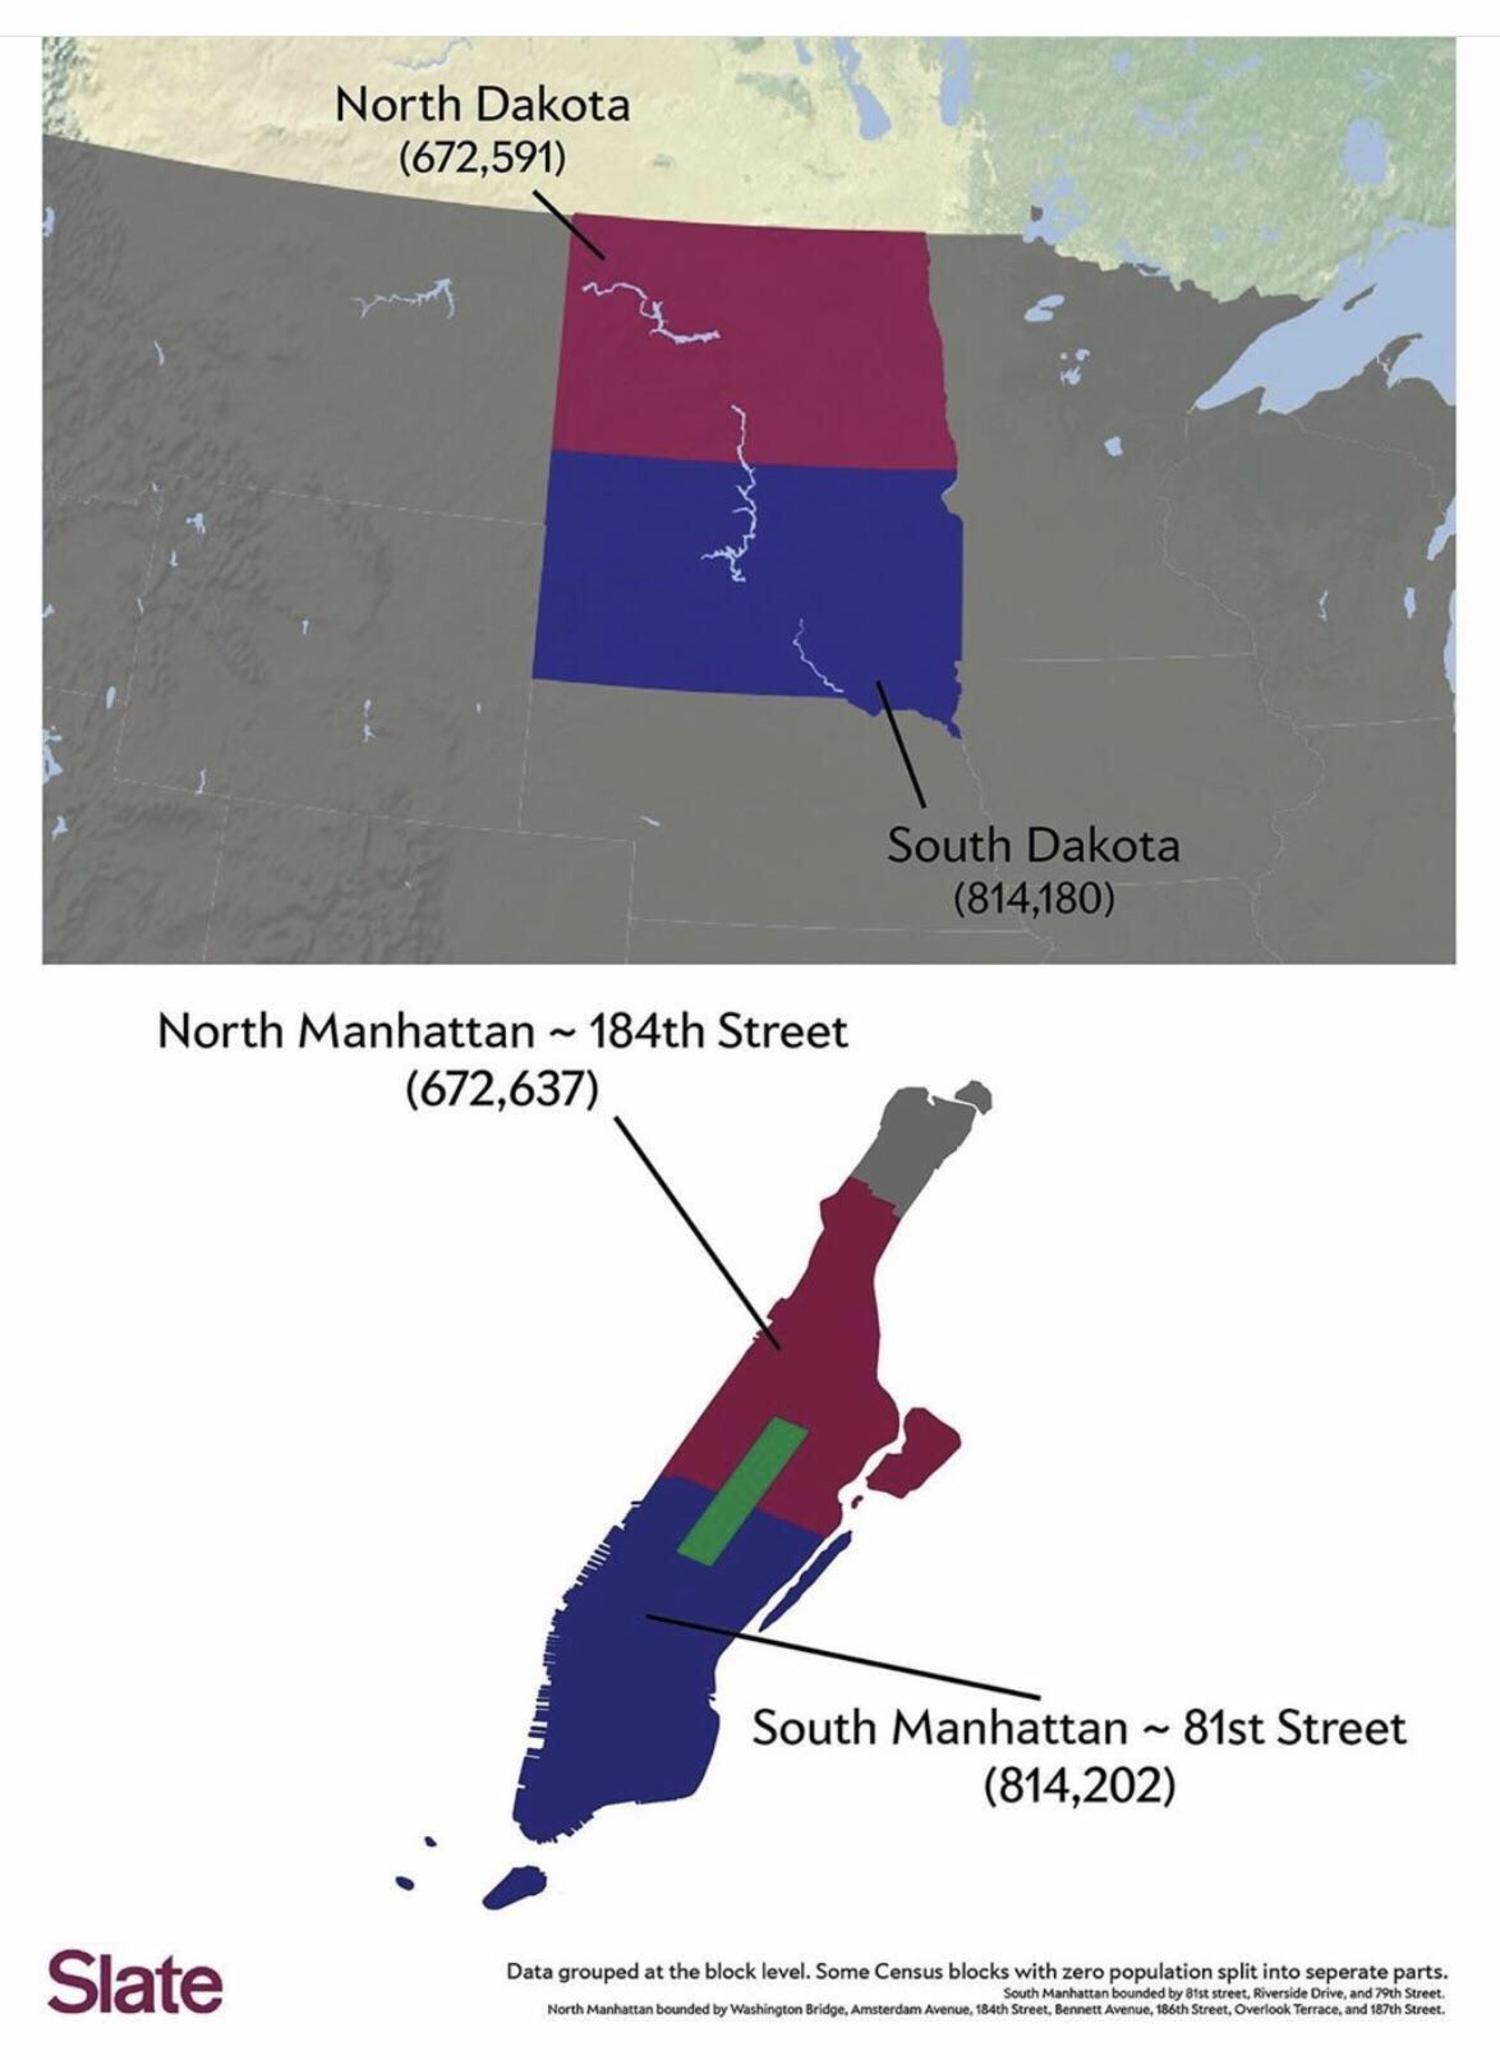 Comparing the population of the Dakotas and Manhattan.